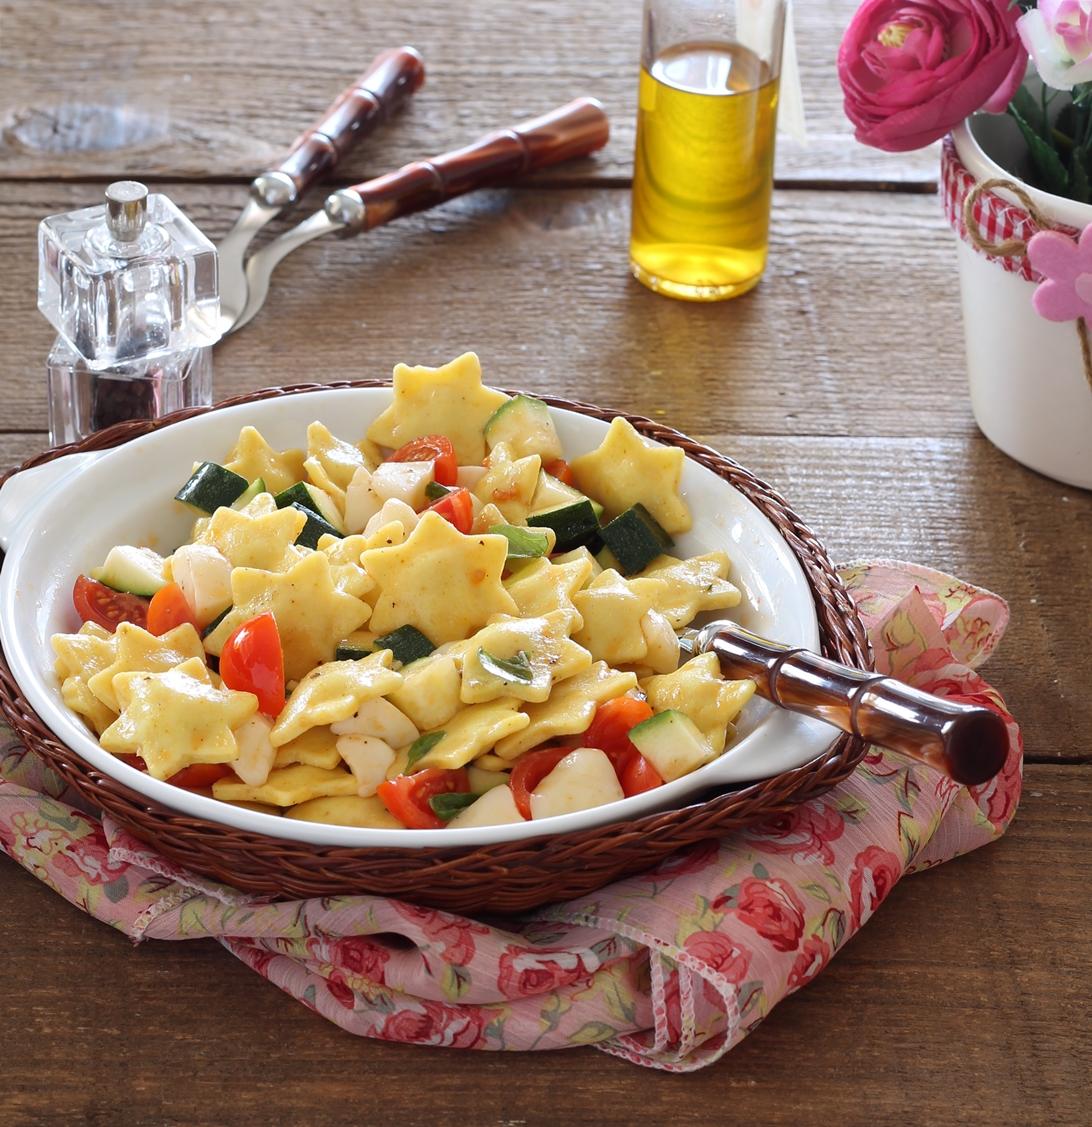 Salade de raviolis sans gluten - La Cassata Celiaca